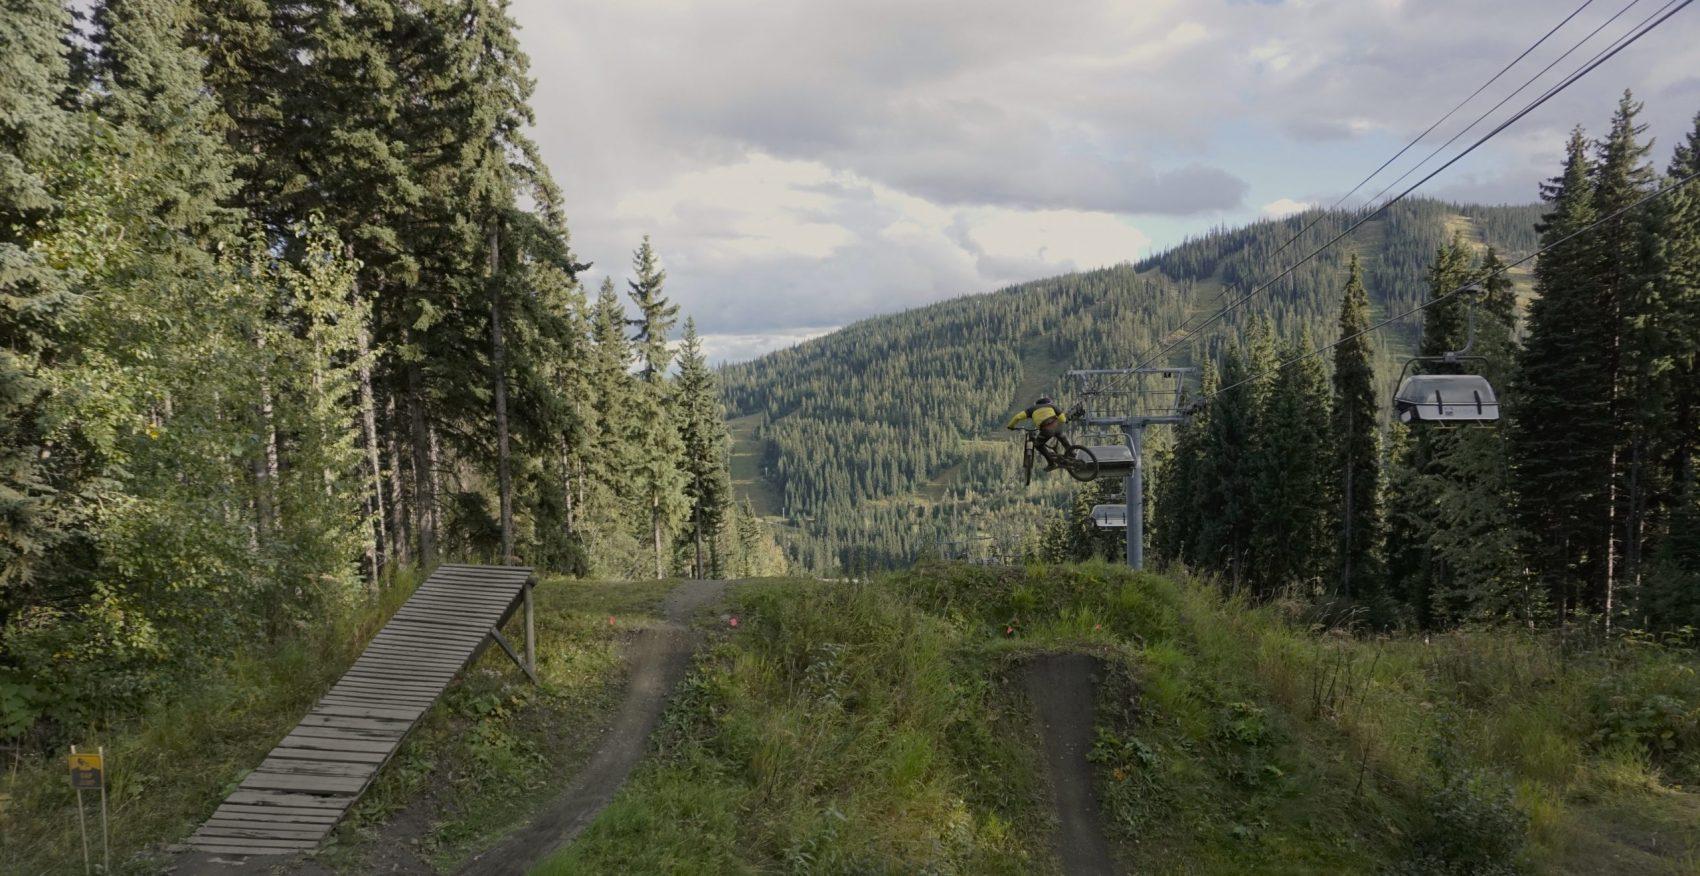 Sun Peaks Bike Park Mountain Biking Chairlift Jump